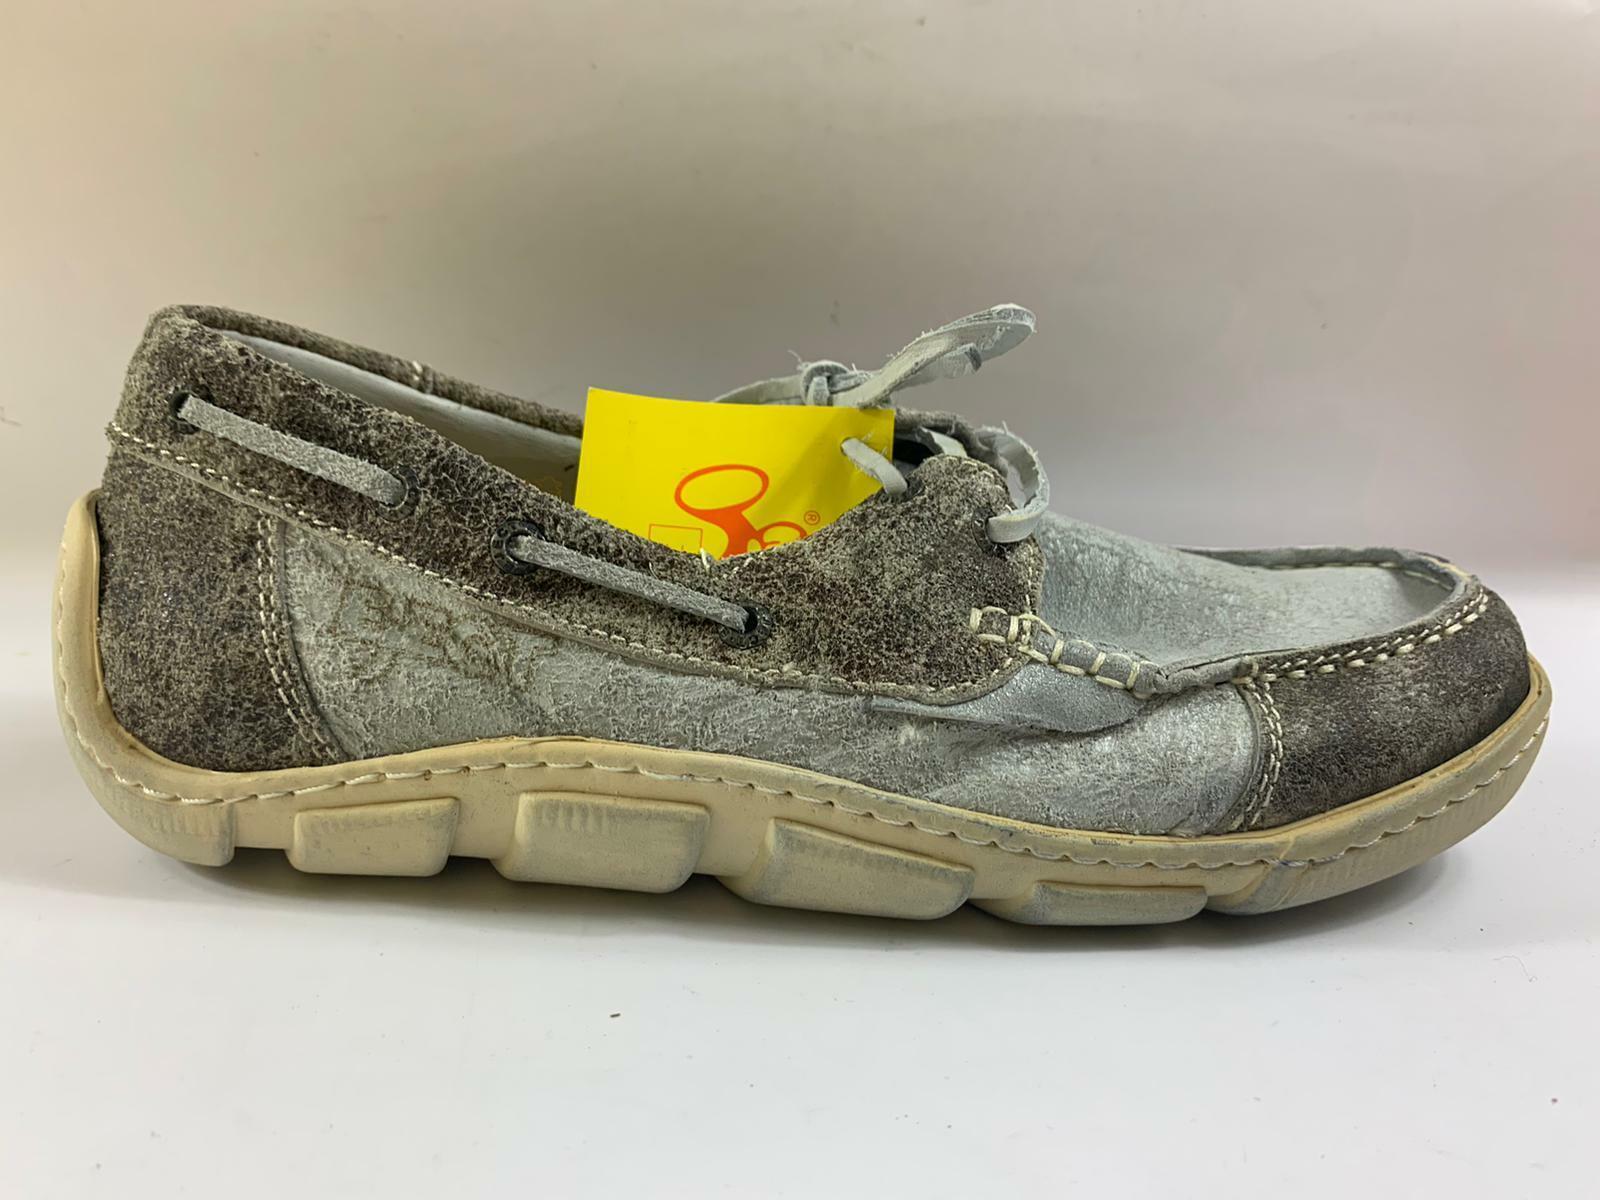 Eject Damen Schuhe Halbschuh Schuhe grau Leder  Größe 37 18.0928/R1A